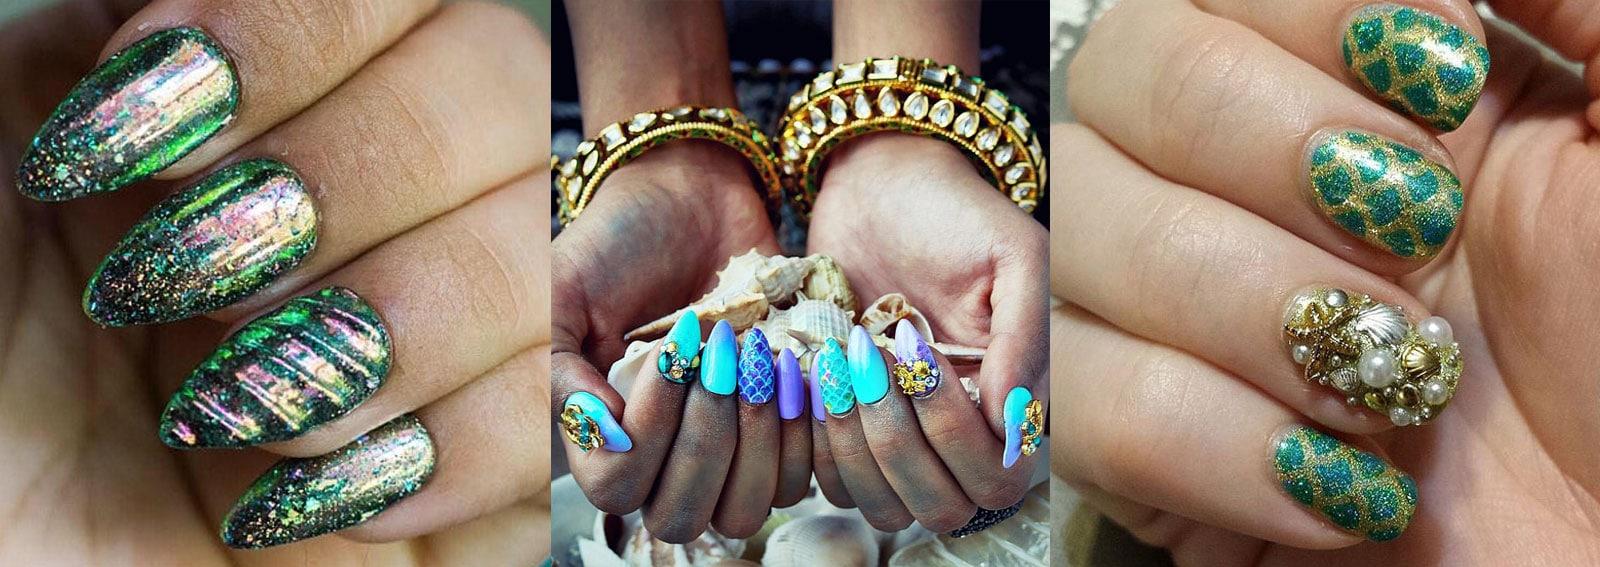 mermaid-nails-nail-art-sirena-unghie-estate-2018-COVER-DESKTOP